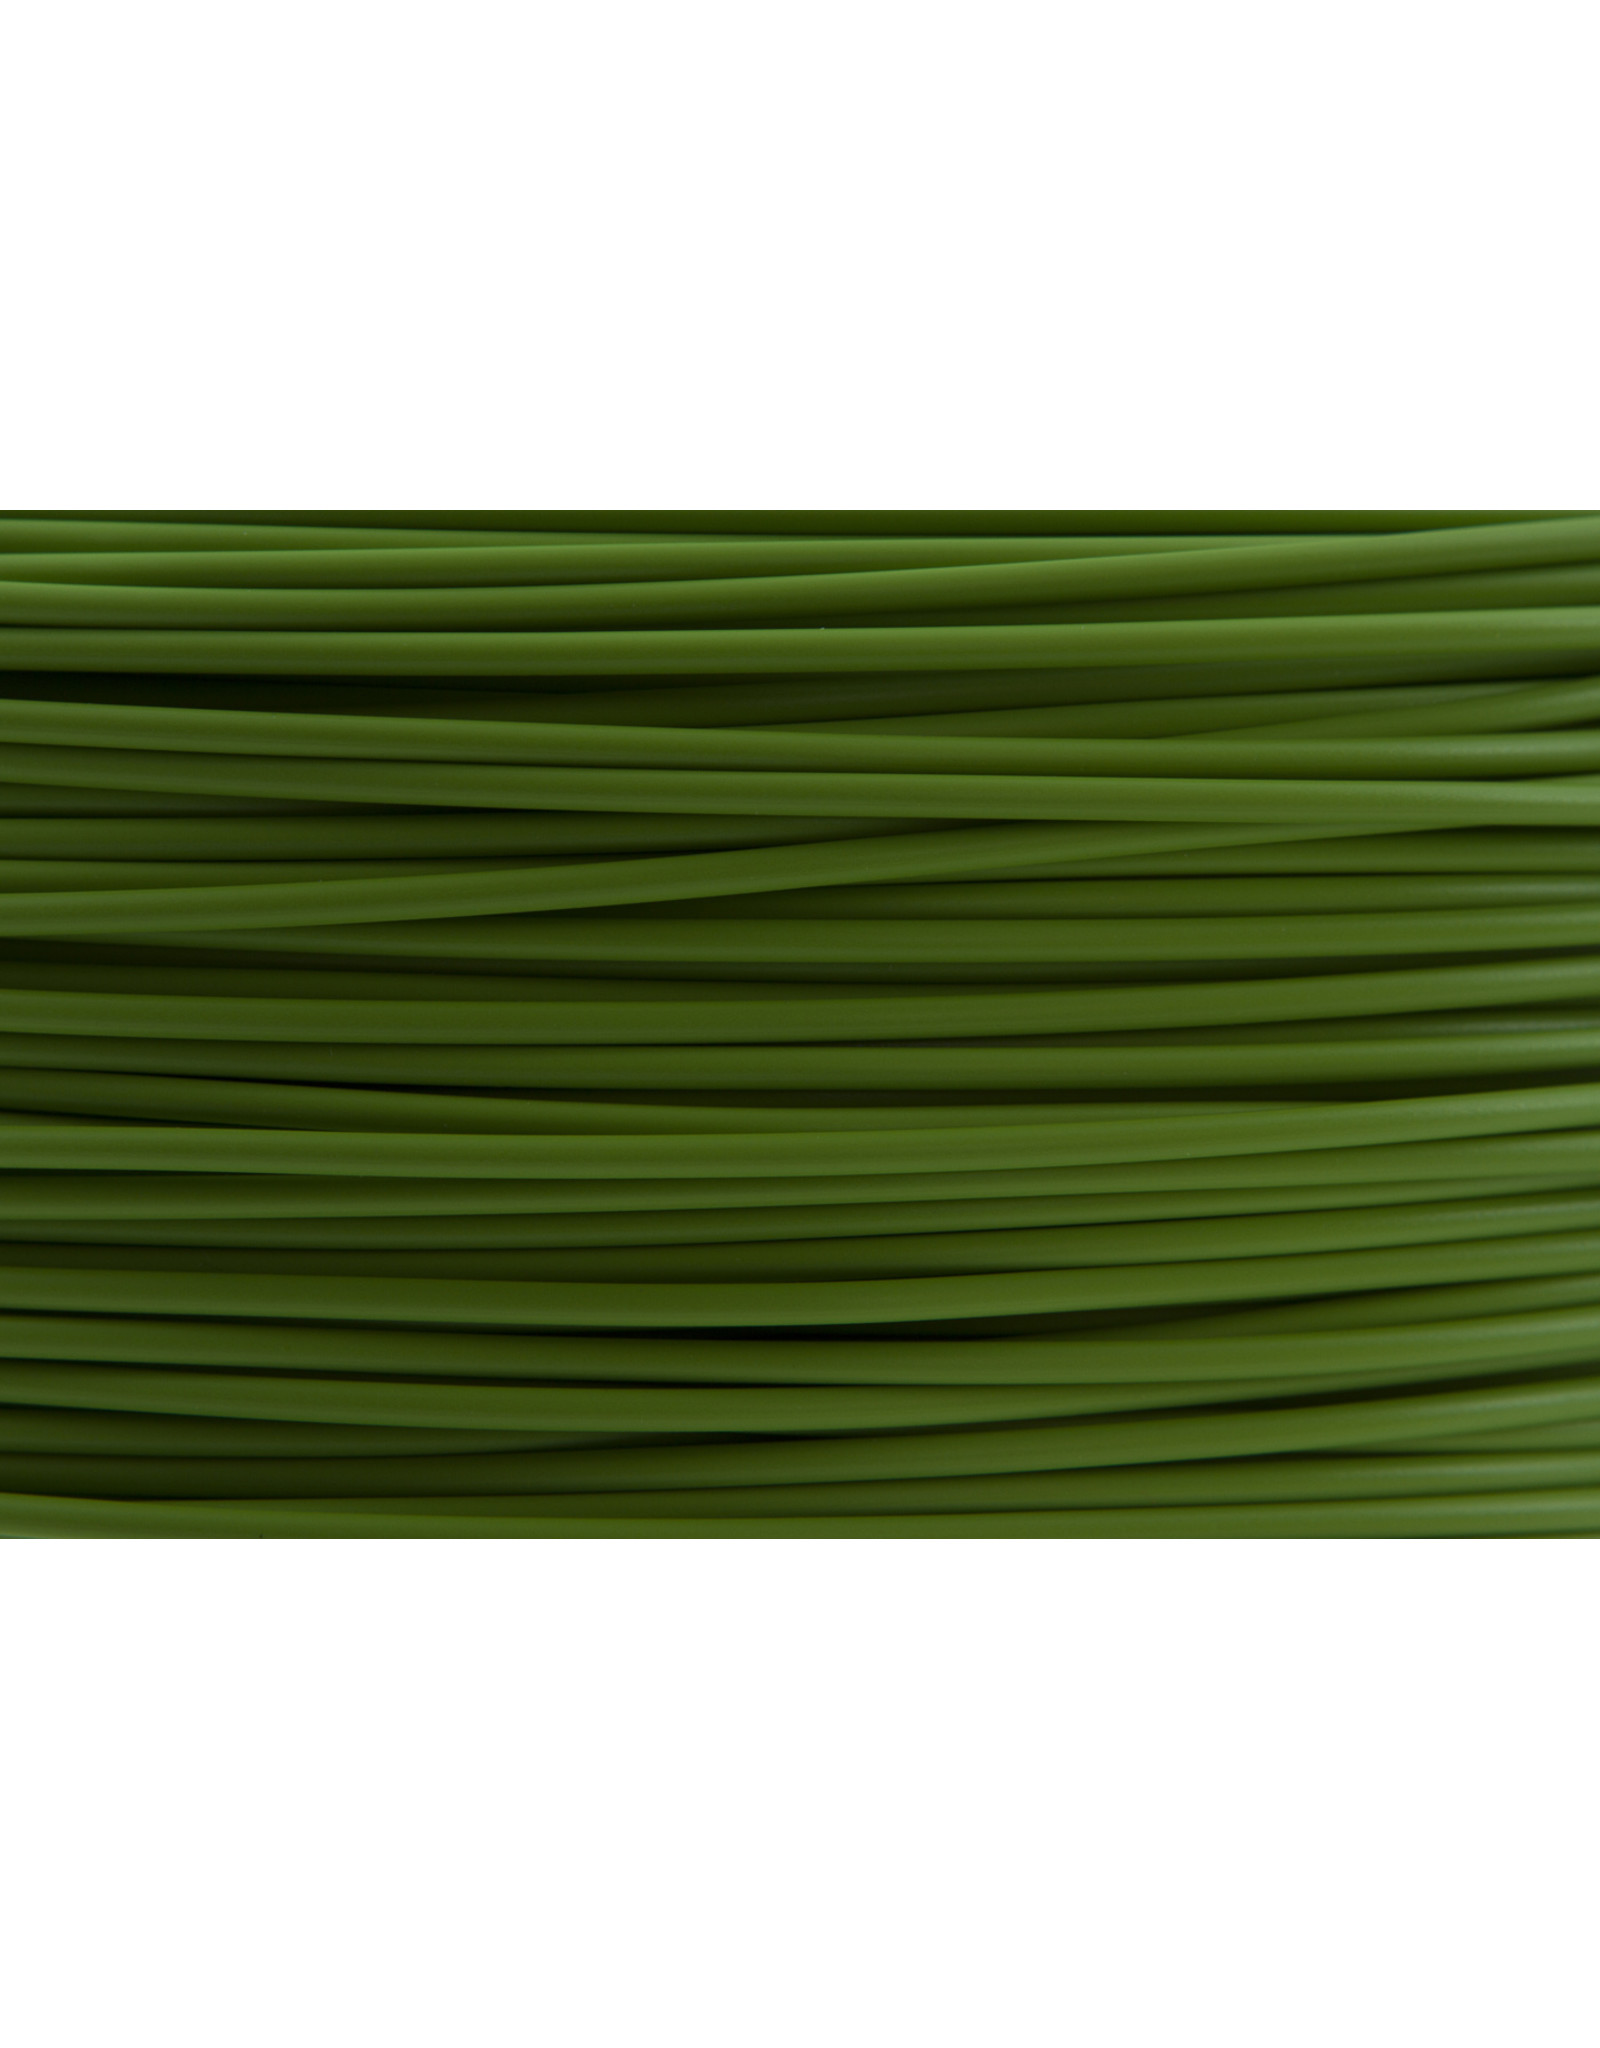 Prima PrimaSelect PLA 1.75mm - 750gr Light Green